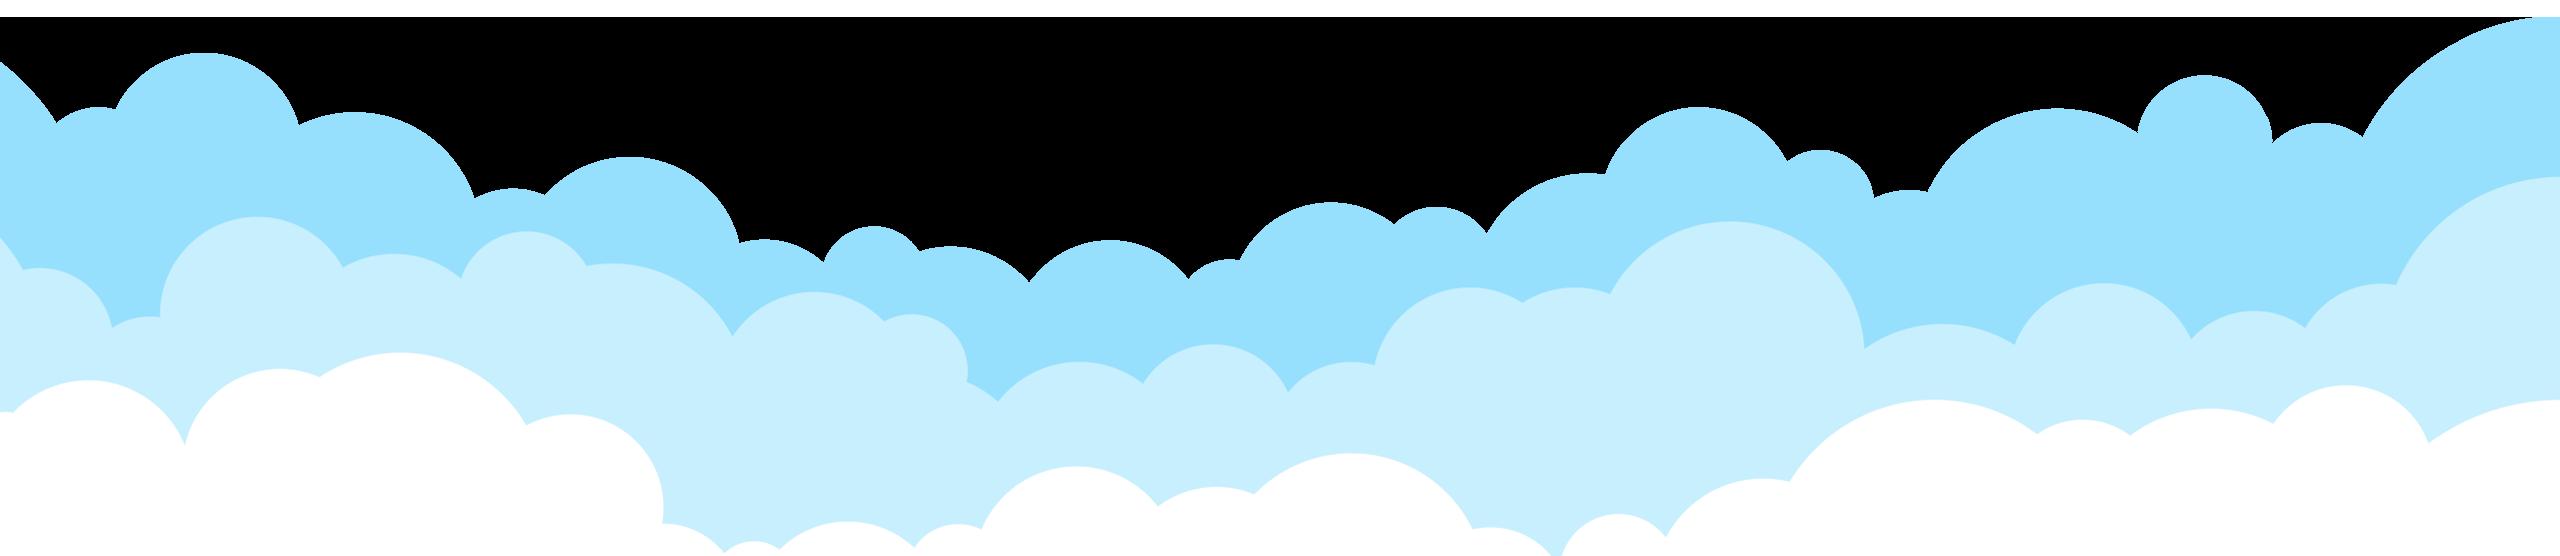 NetZero Cloud Background